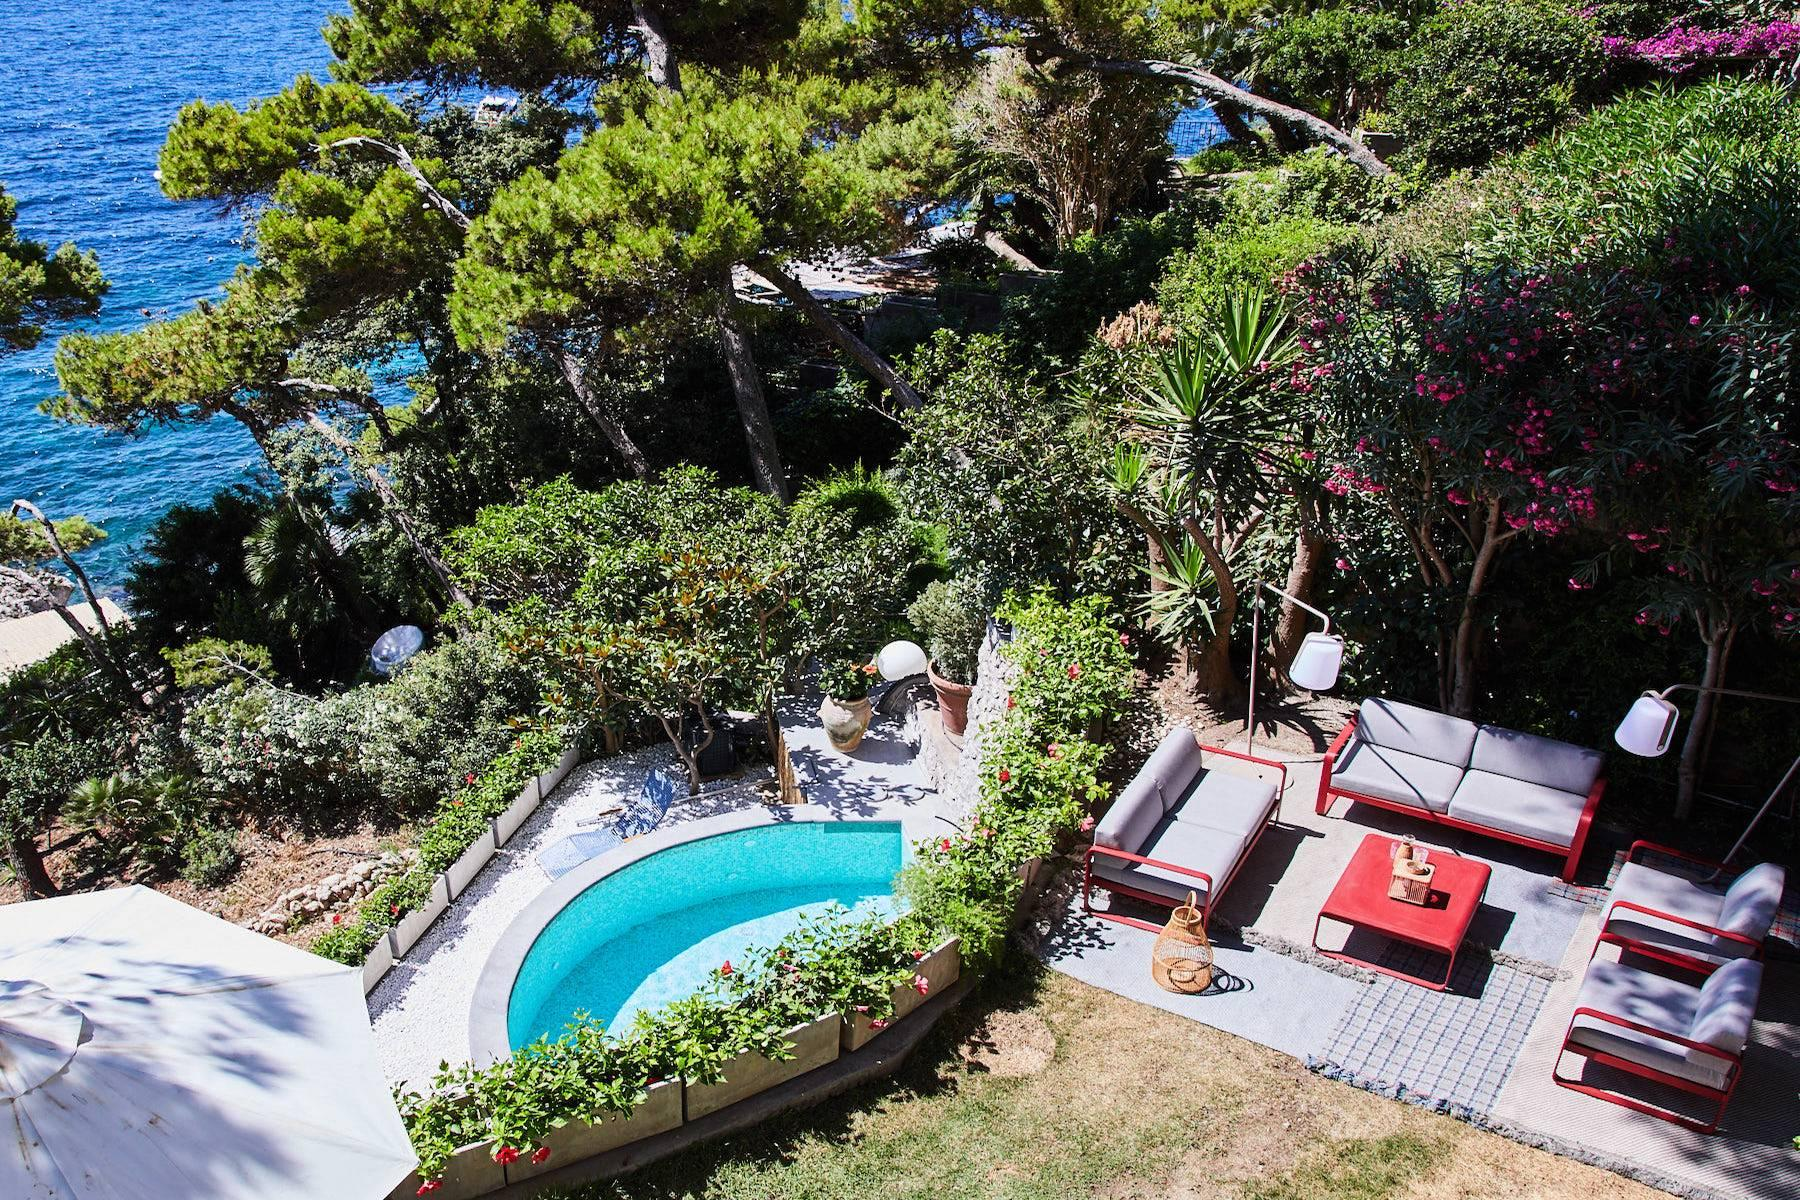 Pied-dans-l'eau Villa in Capri - 3